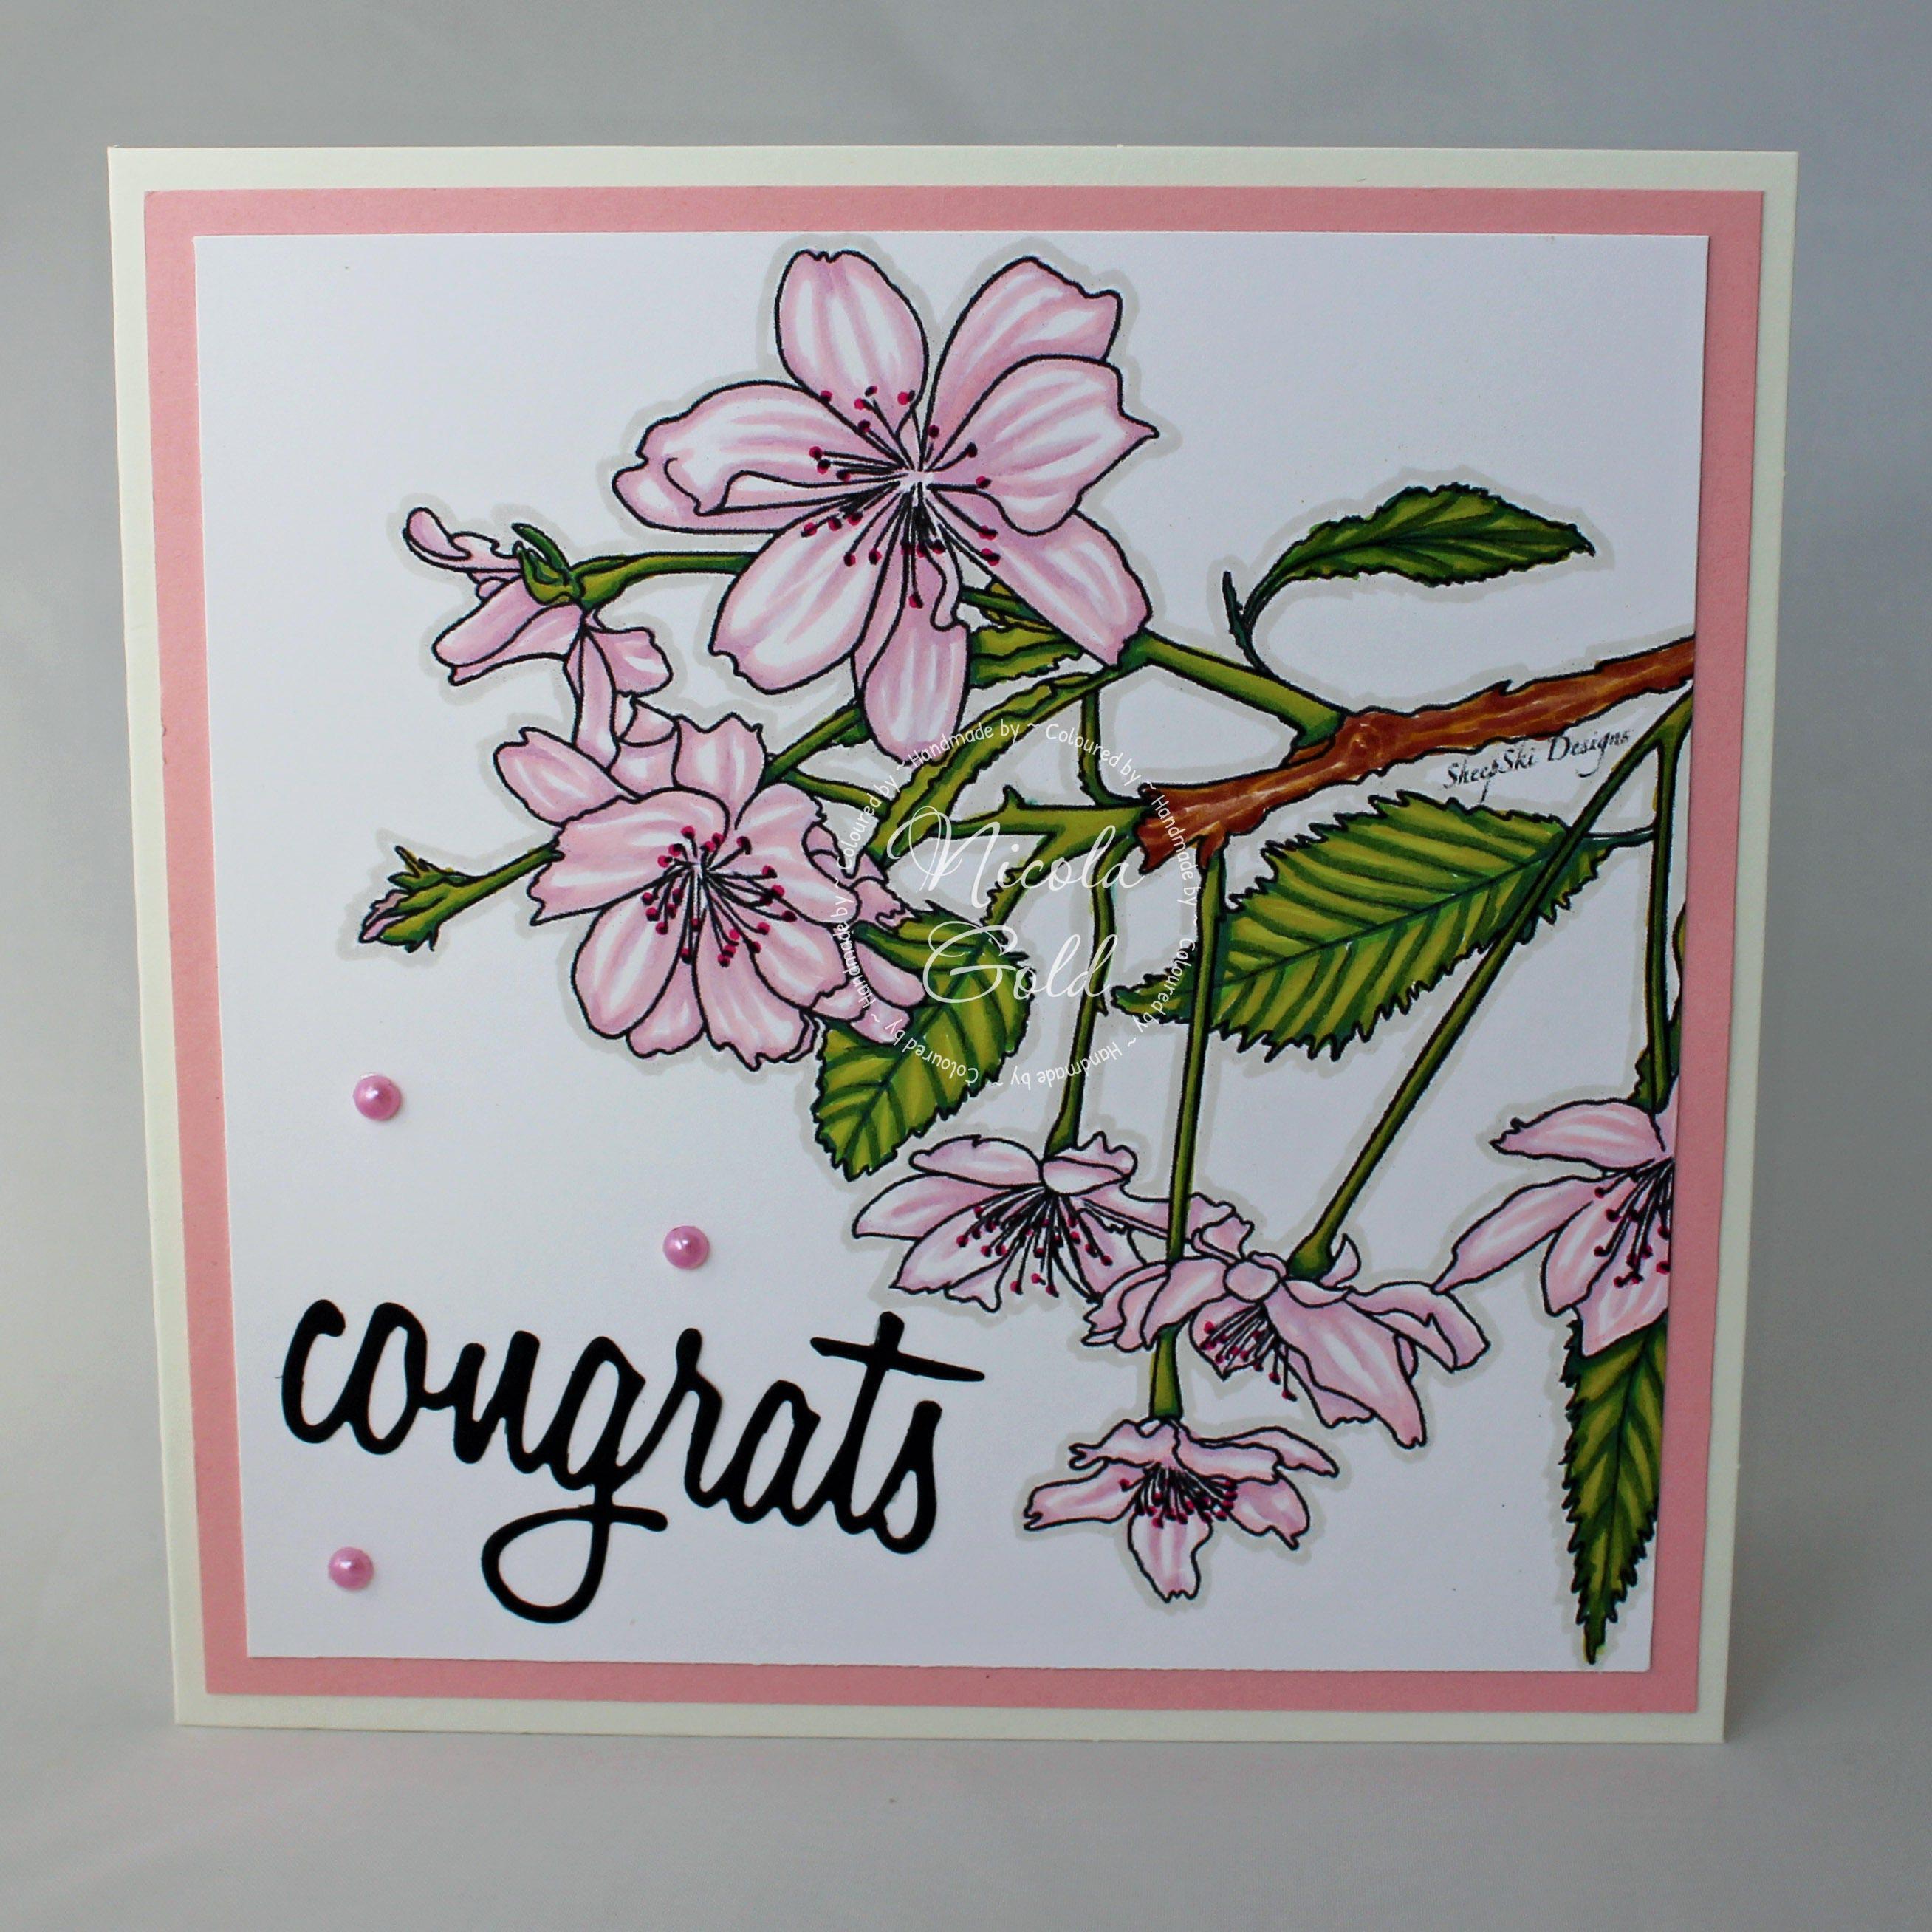 Congrats card cherry blossom card floral card wedding description handmade congrats card kristyandbryce Choice Image